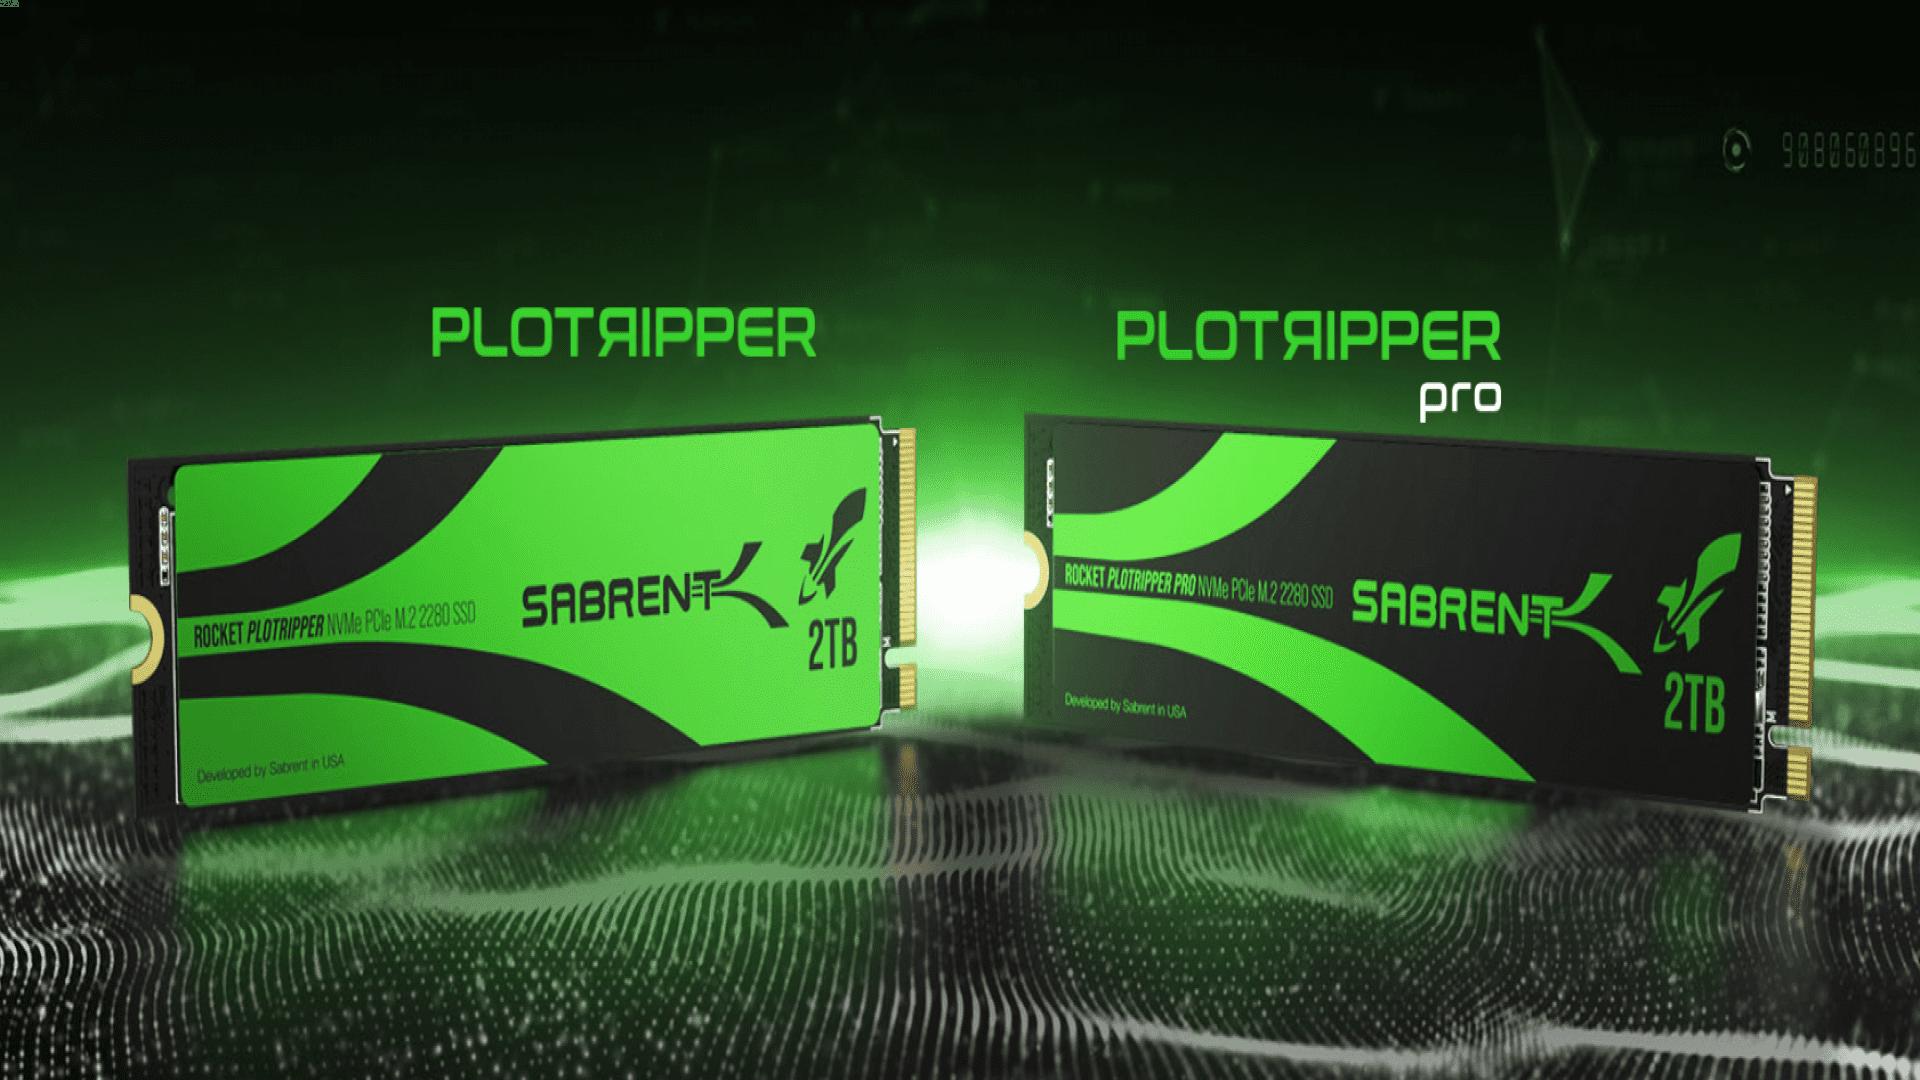 Computex21 : شركة Sabrent تعلن عن وحدات تخزين Plotripper SSD